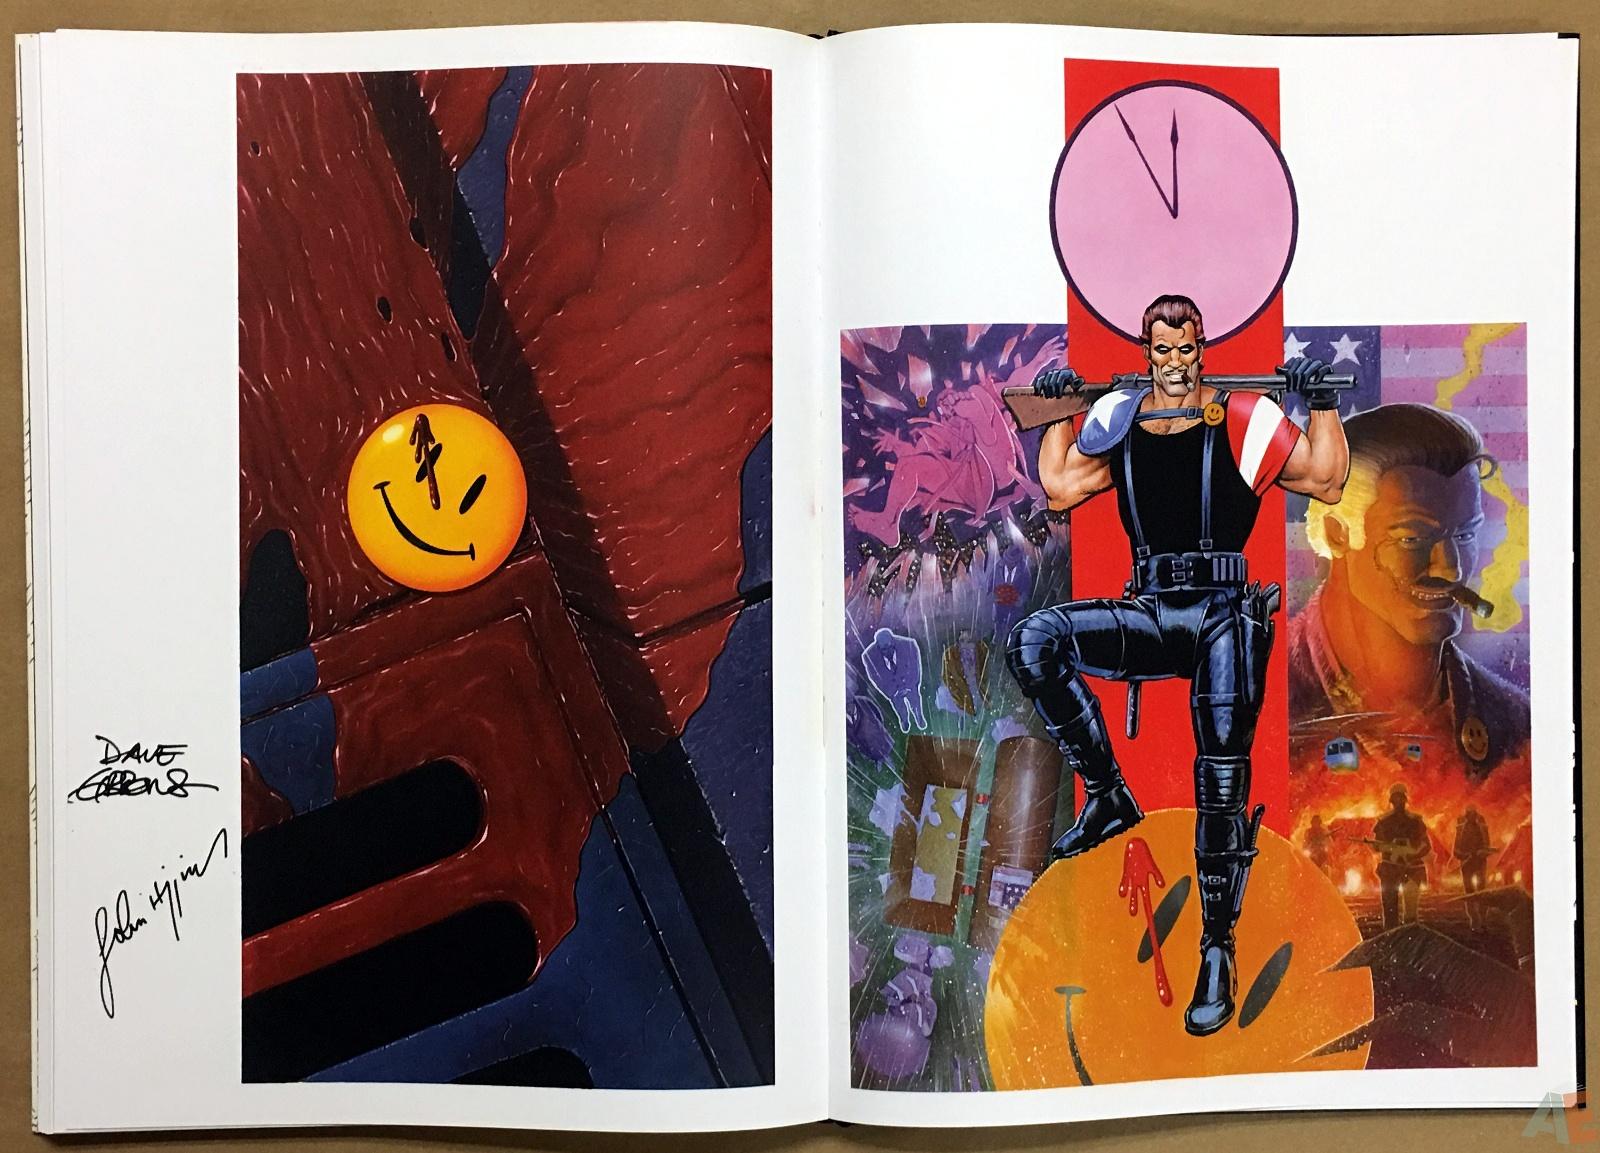 Dave Gibbons Watchmen Artifact Edition 38